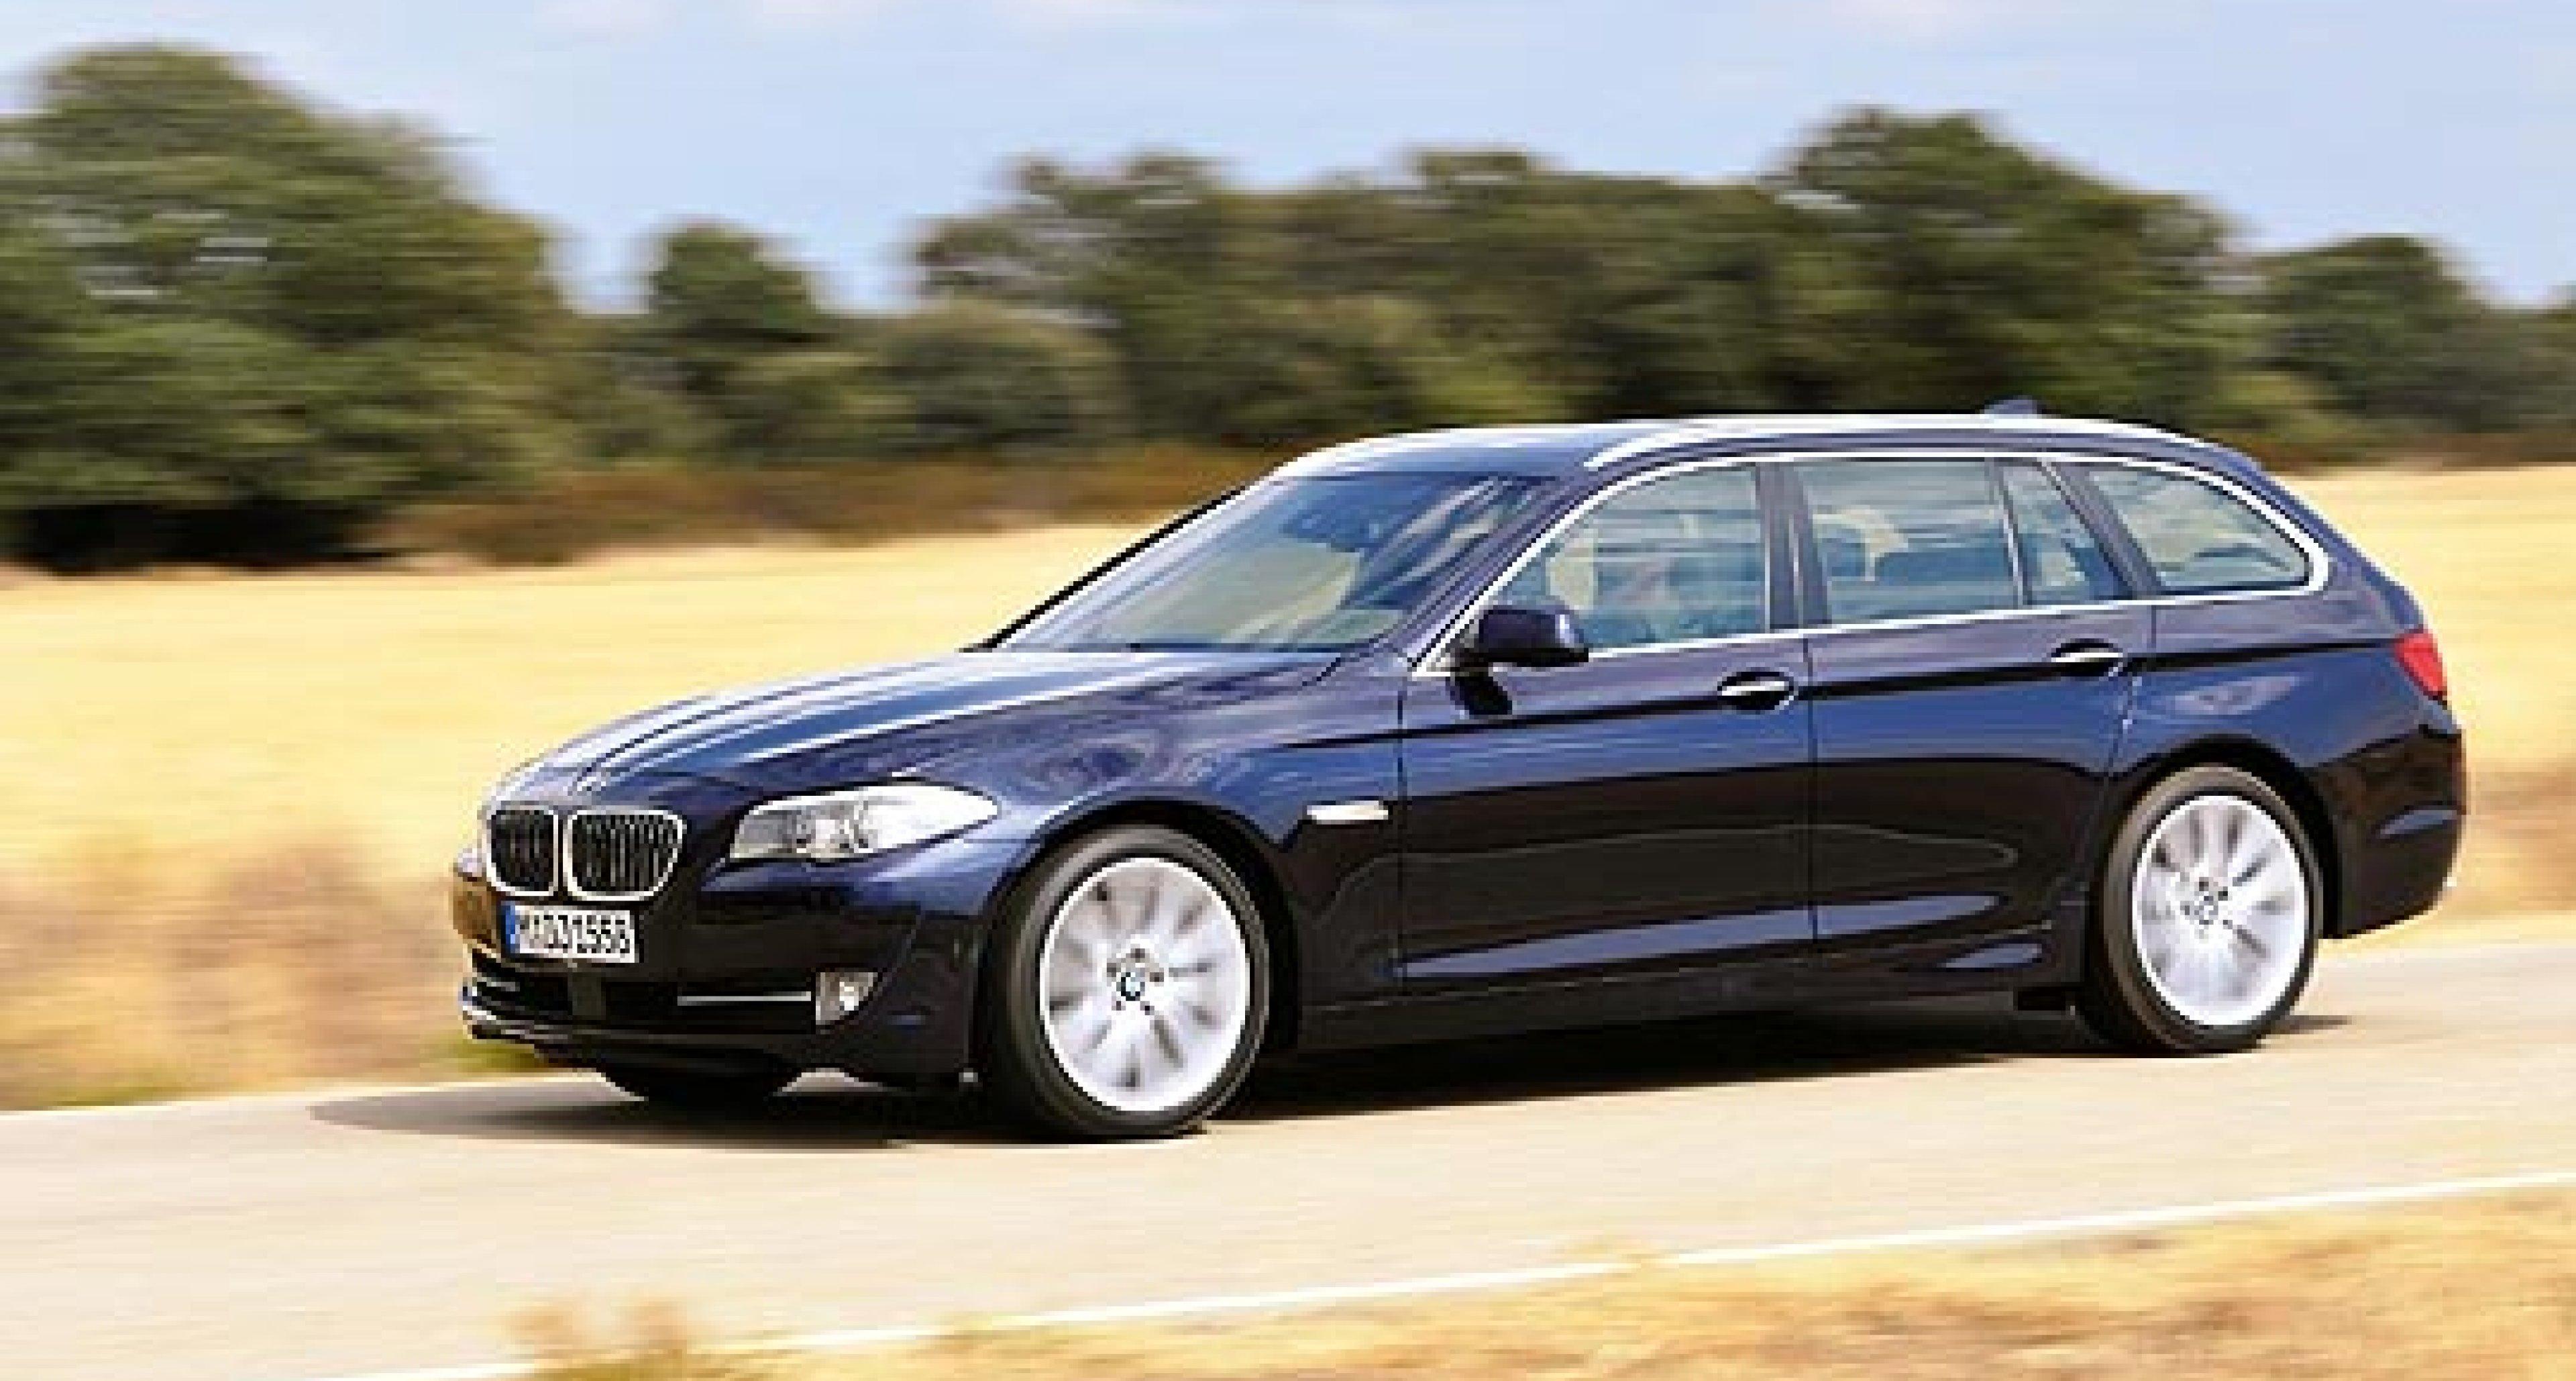 BMW 5 Series Touring: New Estate Joins the Range